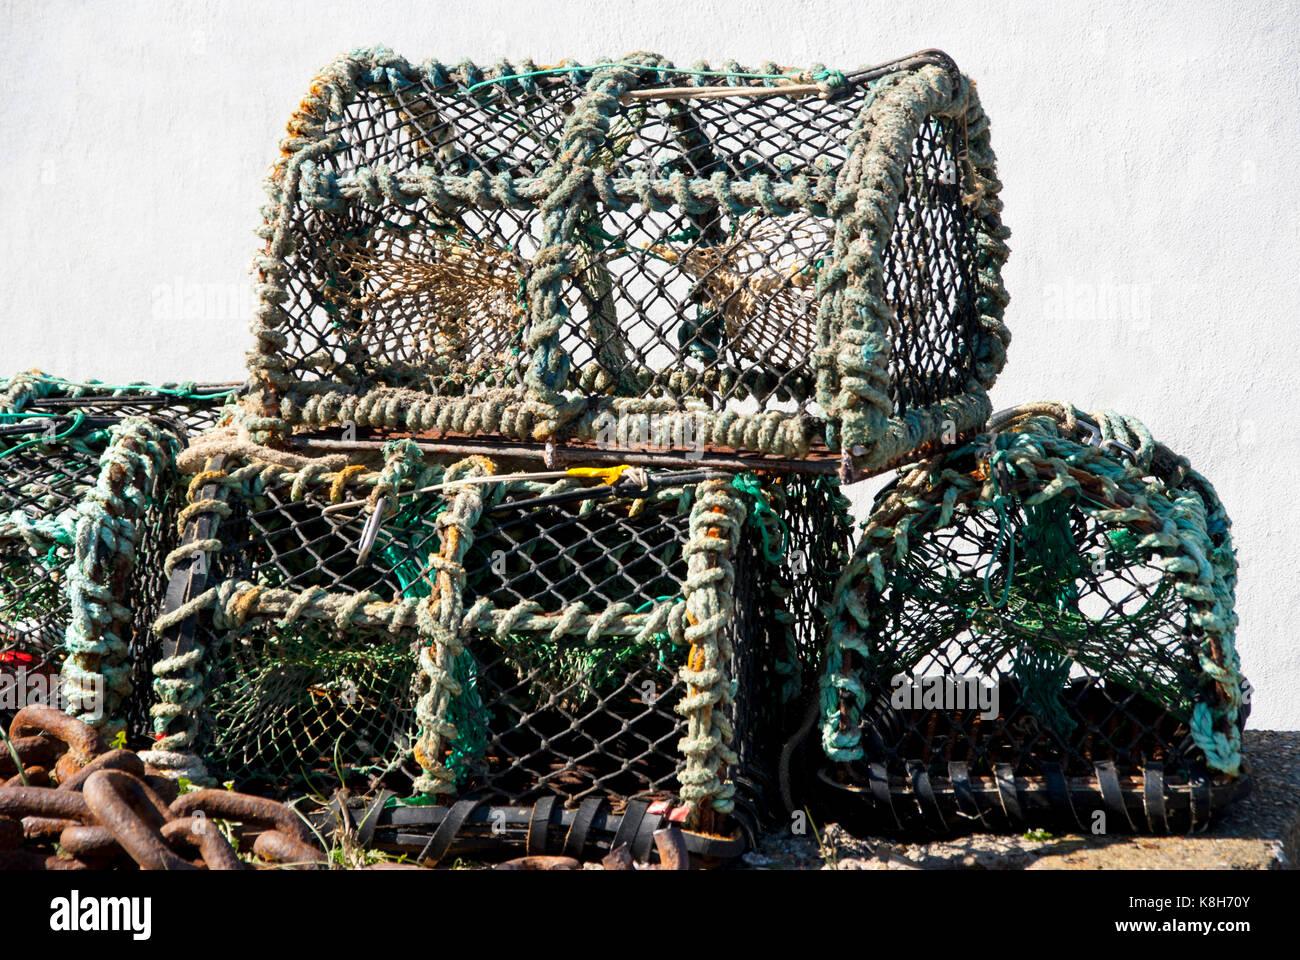 Lobster Baskets in Denmark - Stock Image